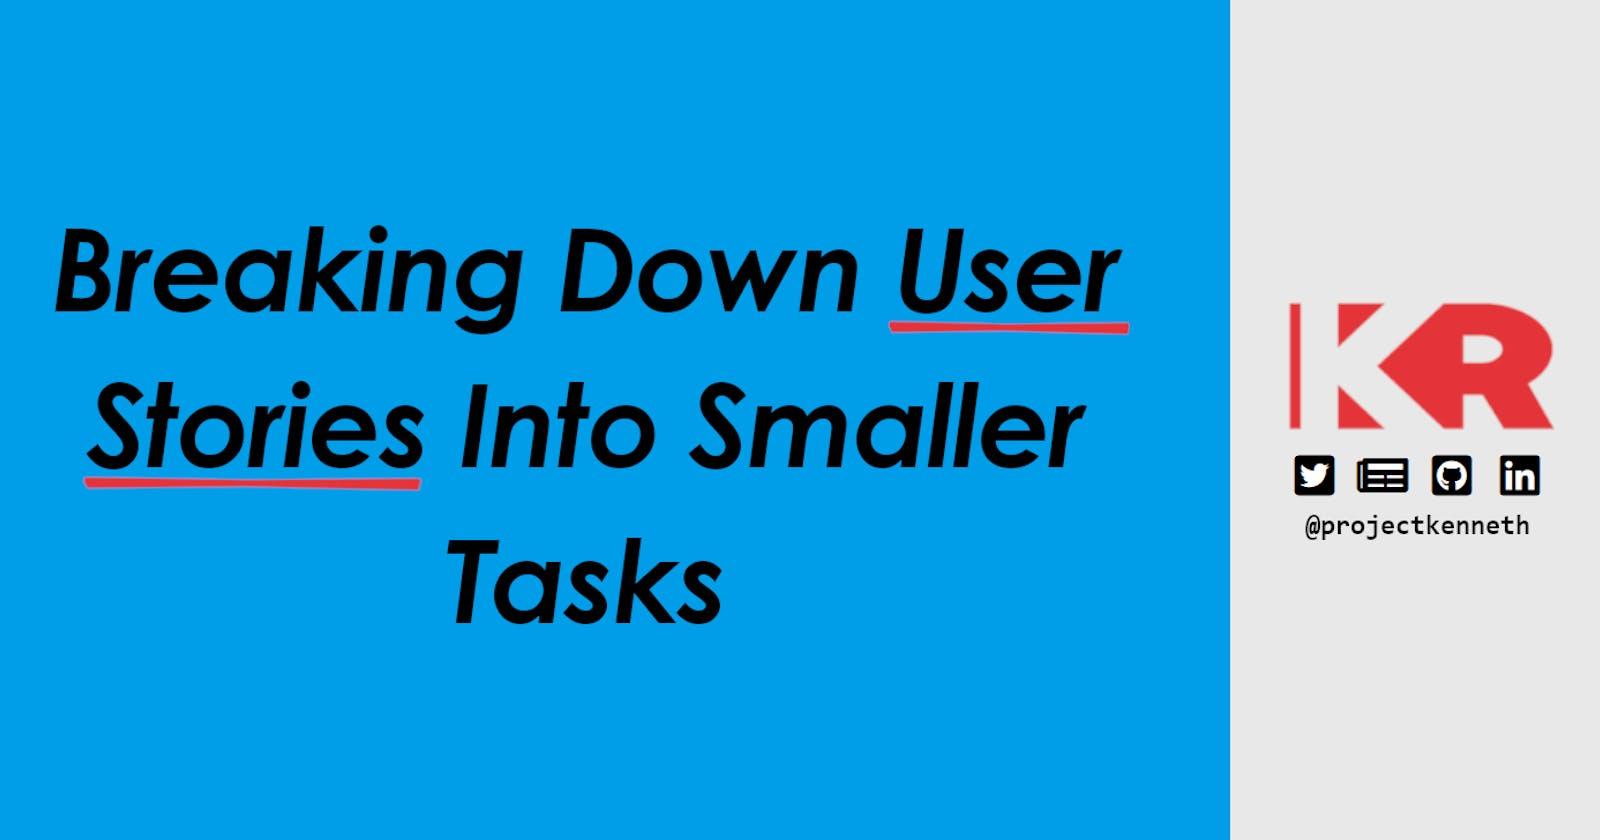 How To Break Down User Stories Into Smaller Tasks